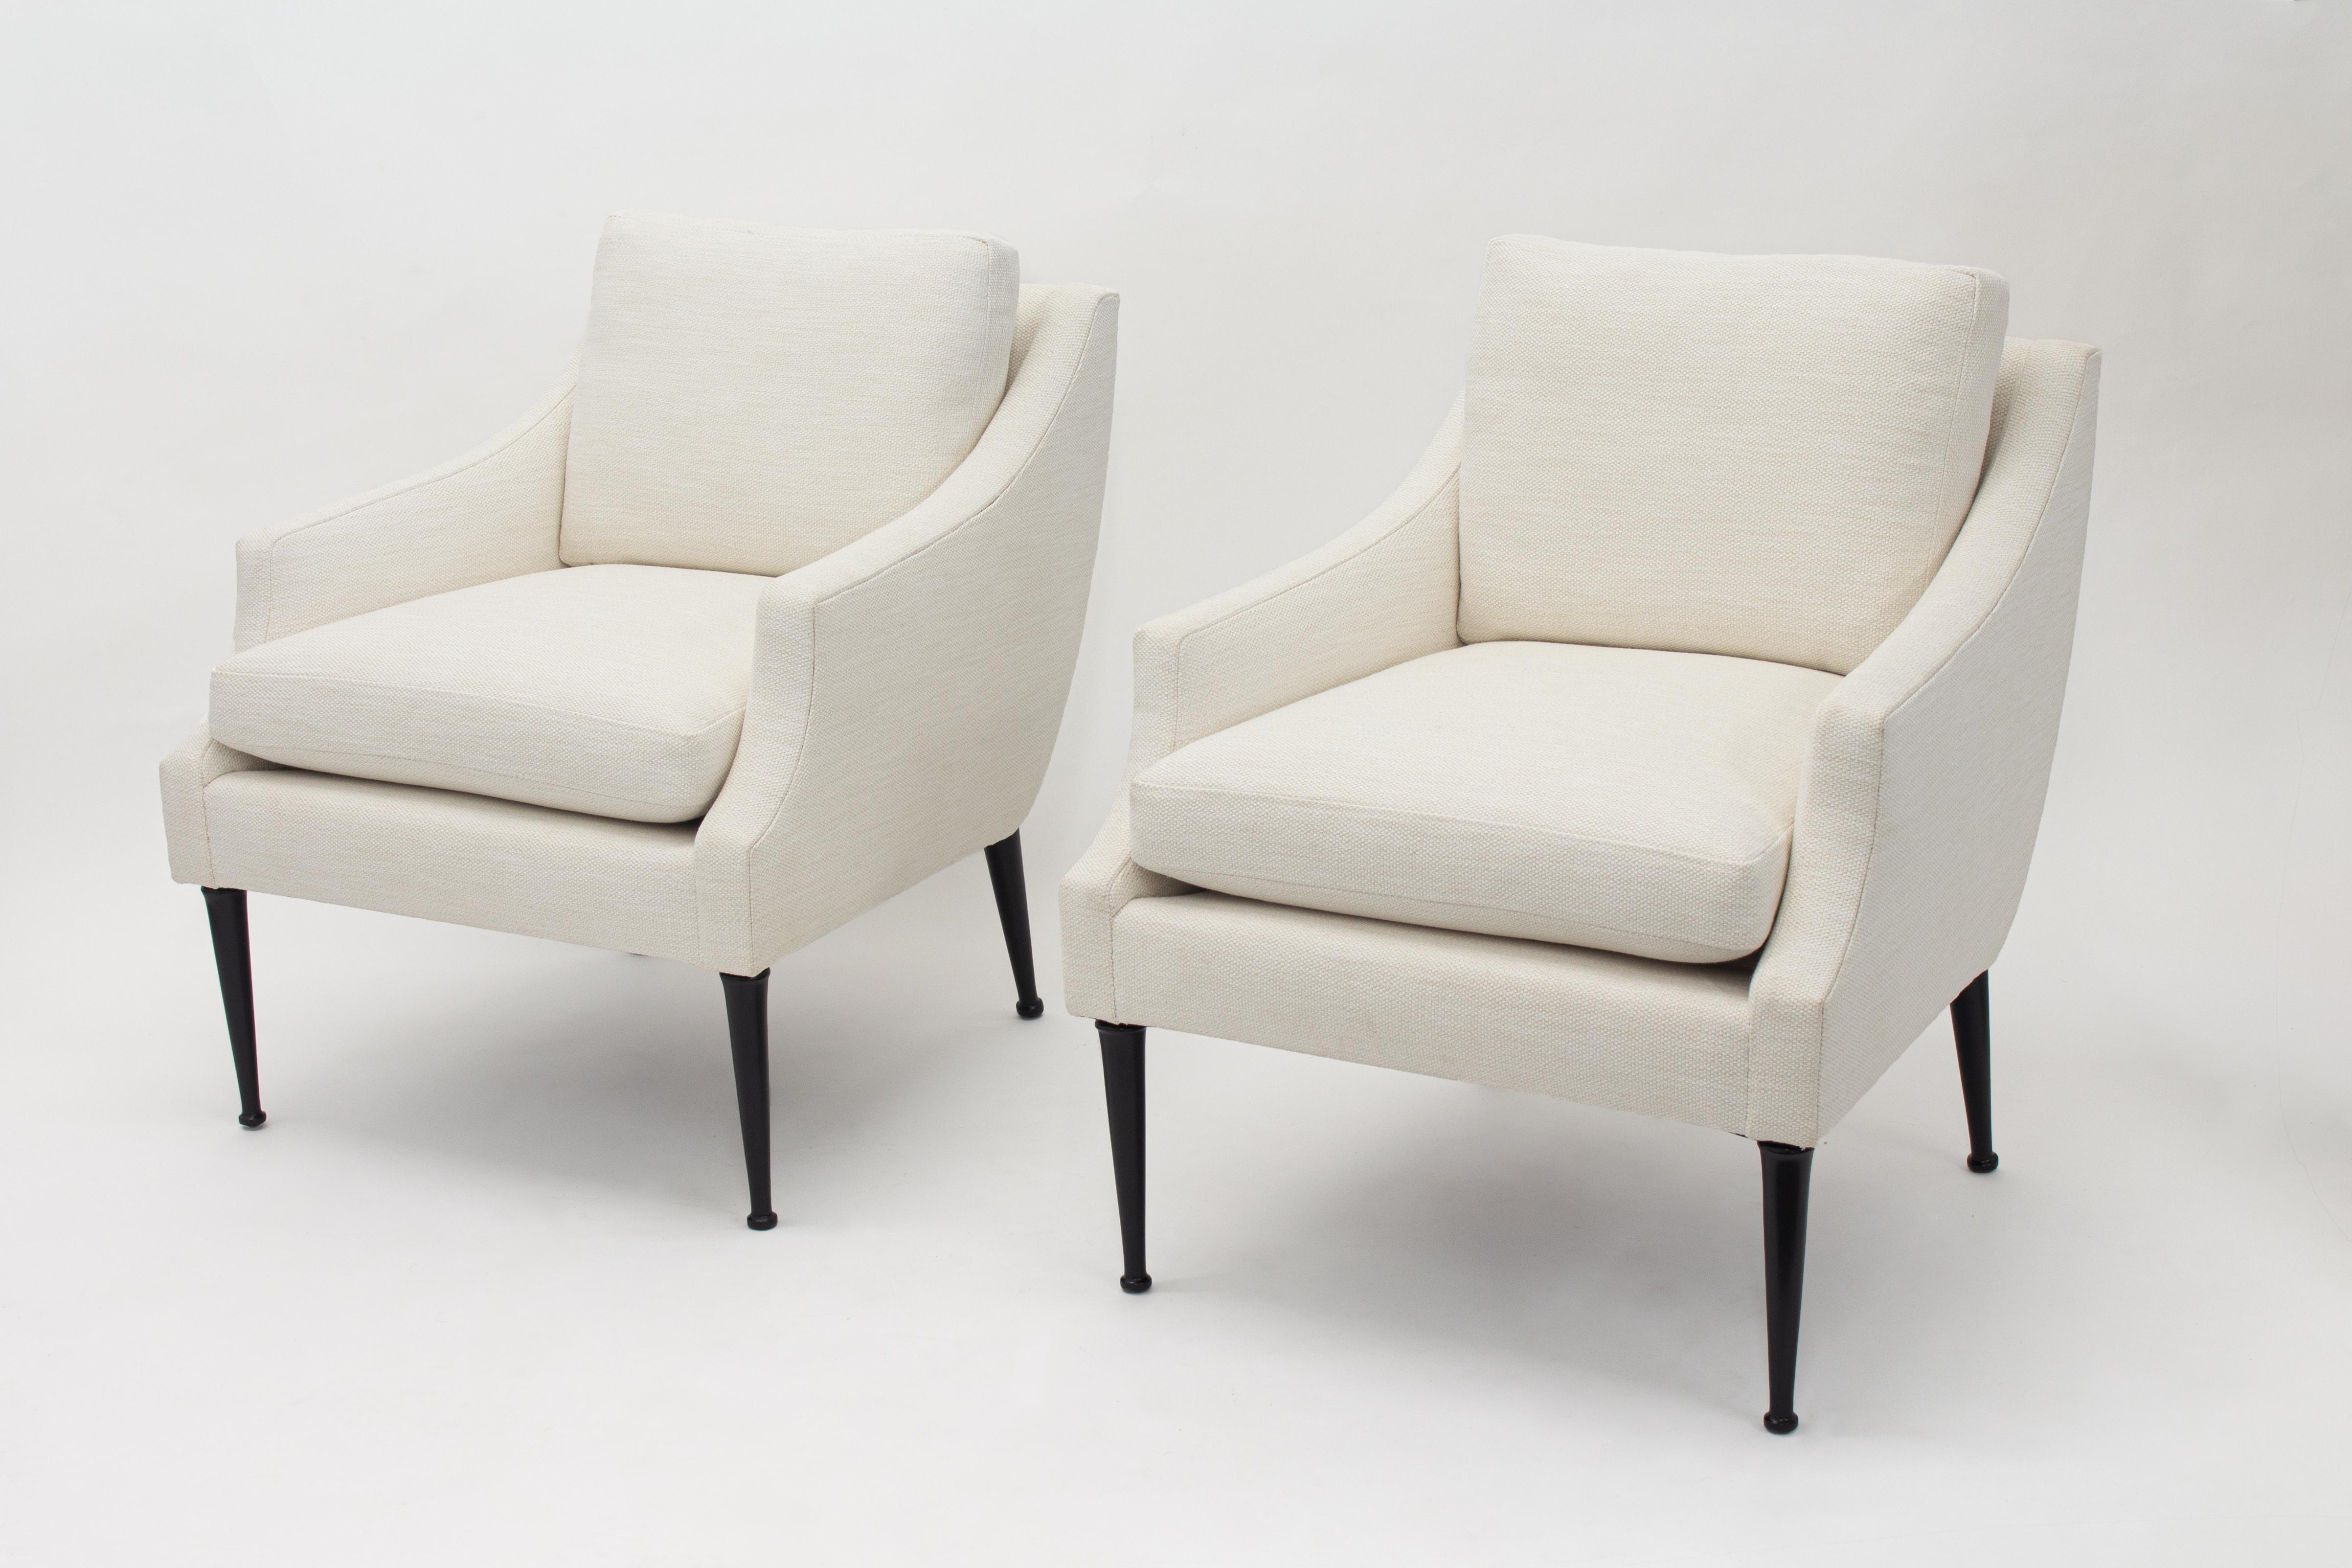 Pair Mid Century Modern Arm Chairs by Karpen